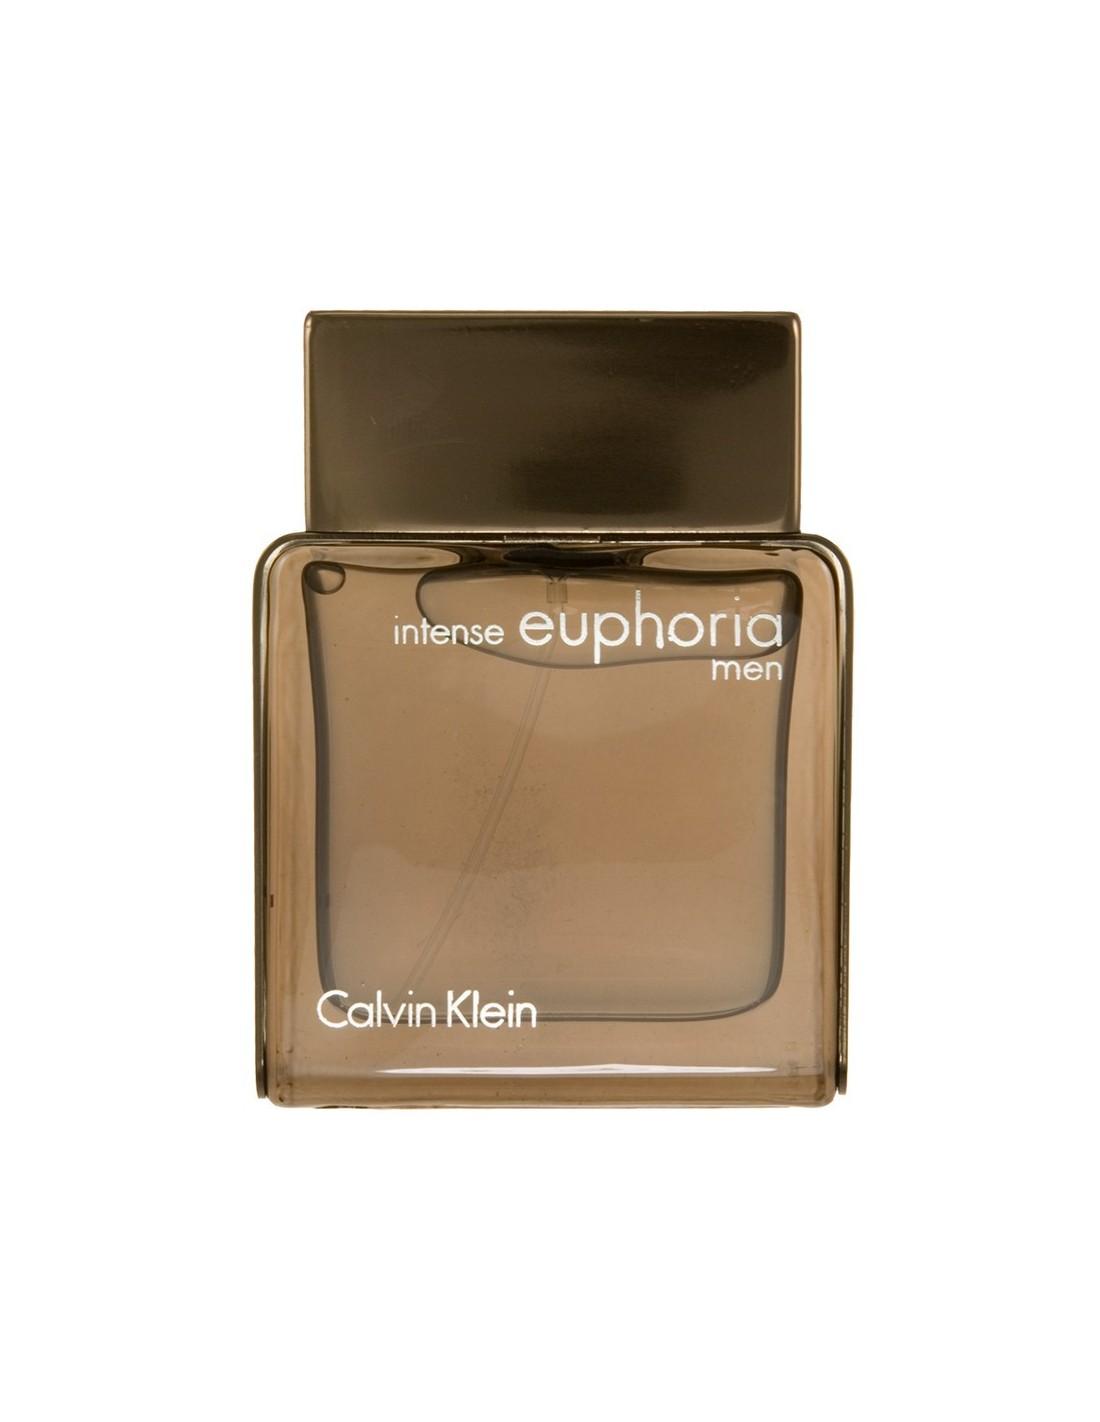 26d49677e عطر کالوین کلین ایفوریا اینتنس (سی کی یوفوریا اینتنس) مردانه Calvin Klein  Euphoria Intense